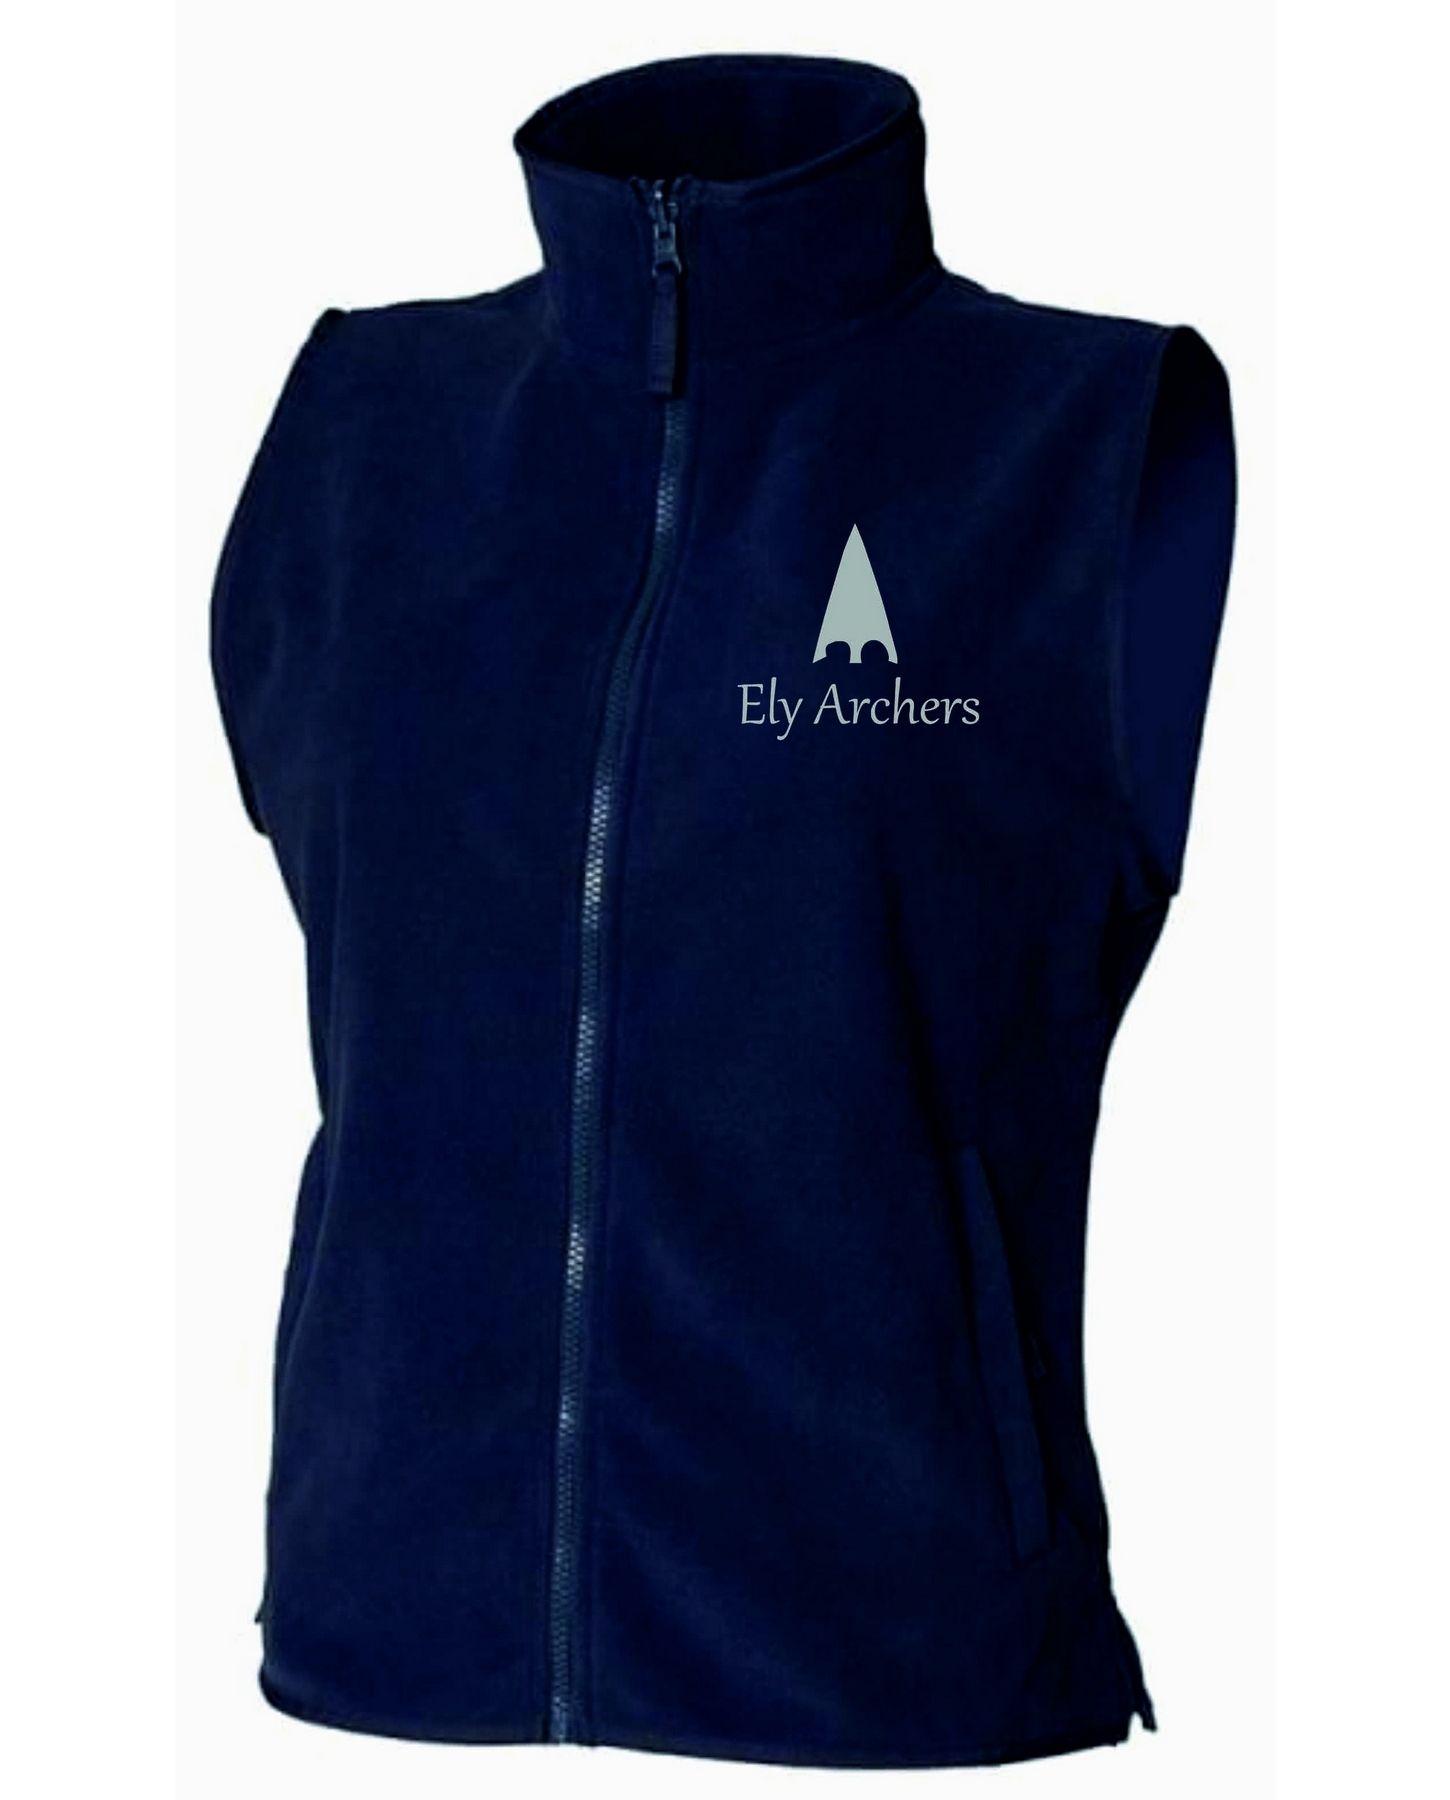 Ely Archers Women's Henbury Sleeveless Microfleece